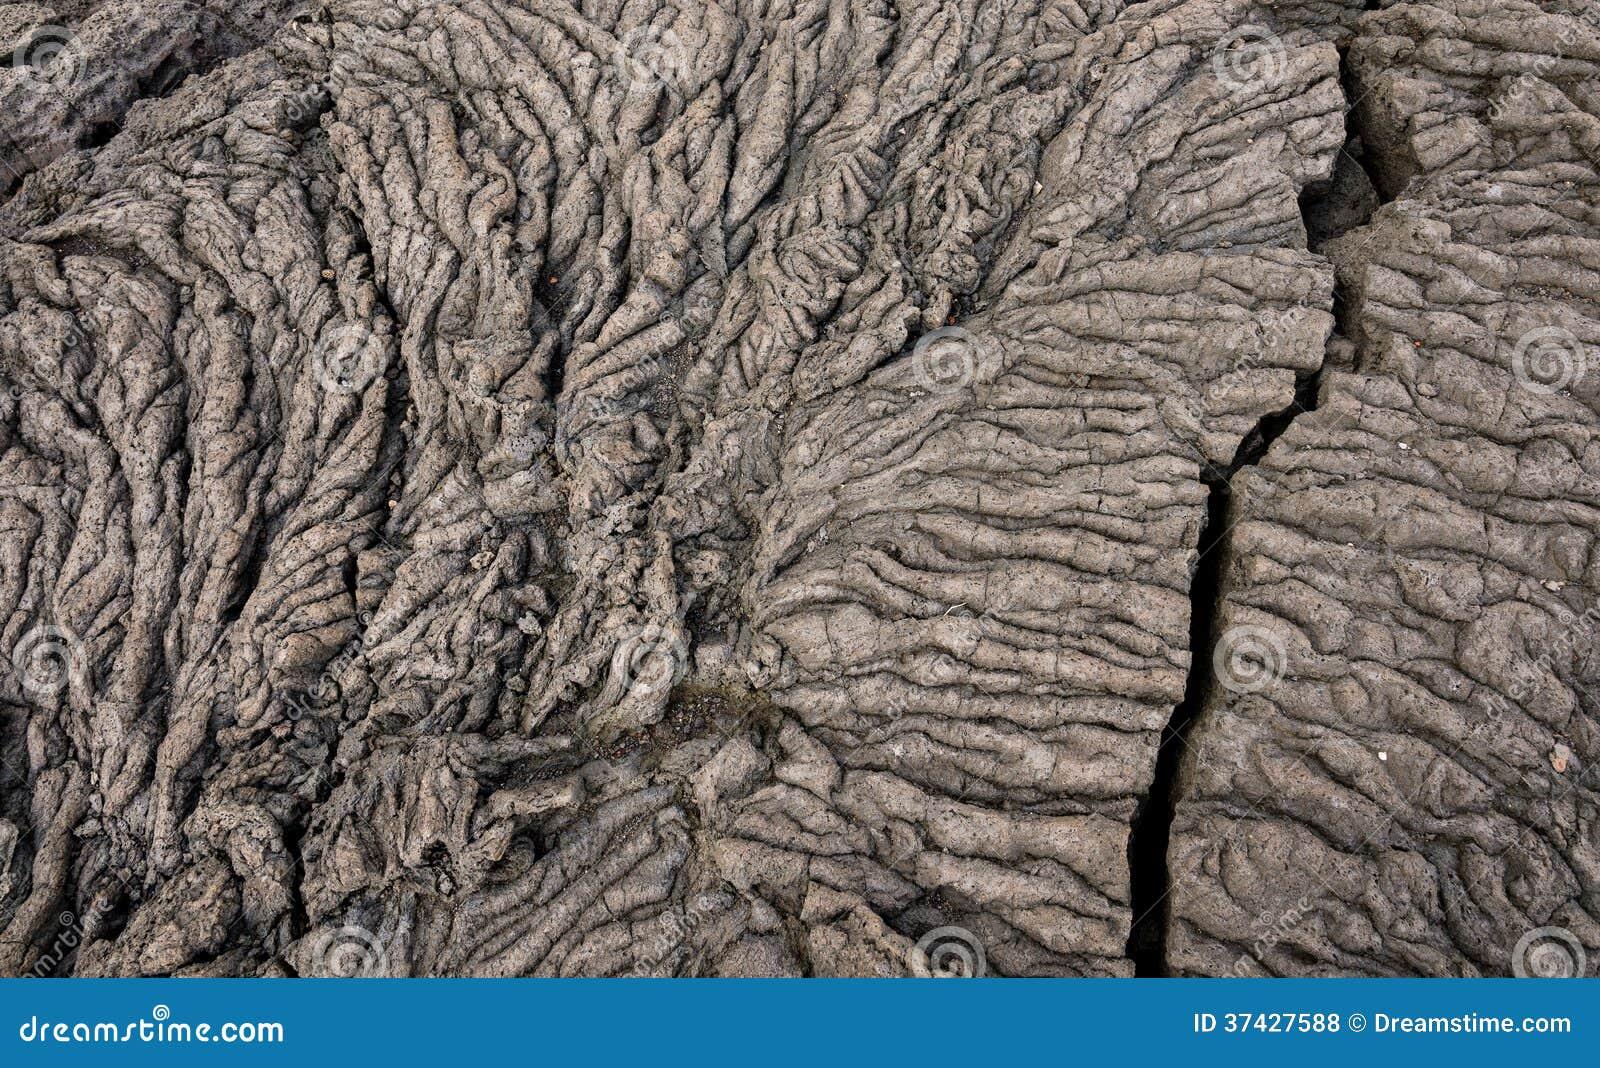 Solid Pahoehoe lava rock